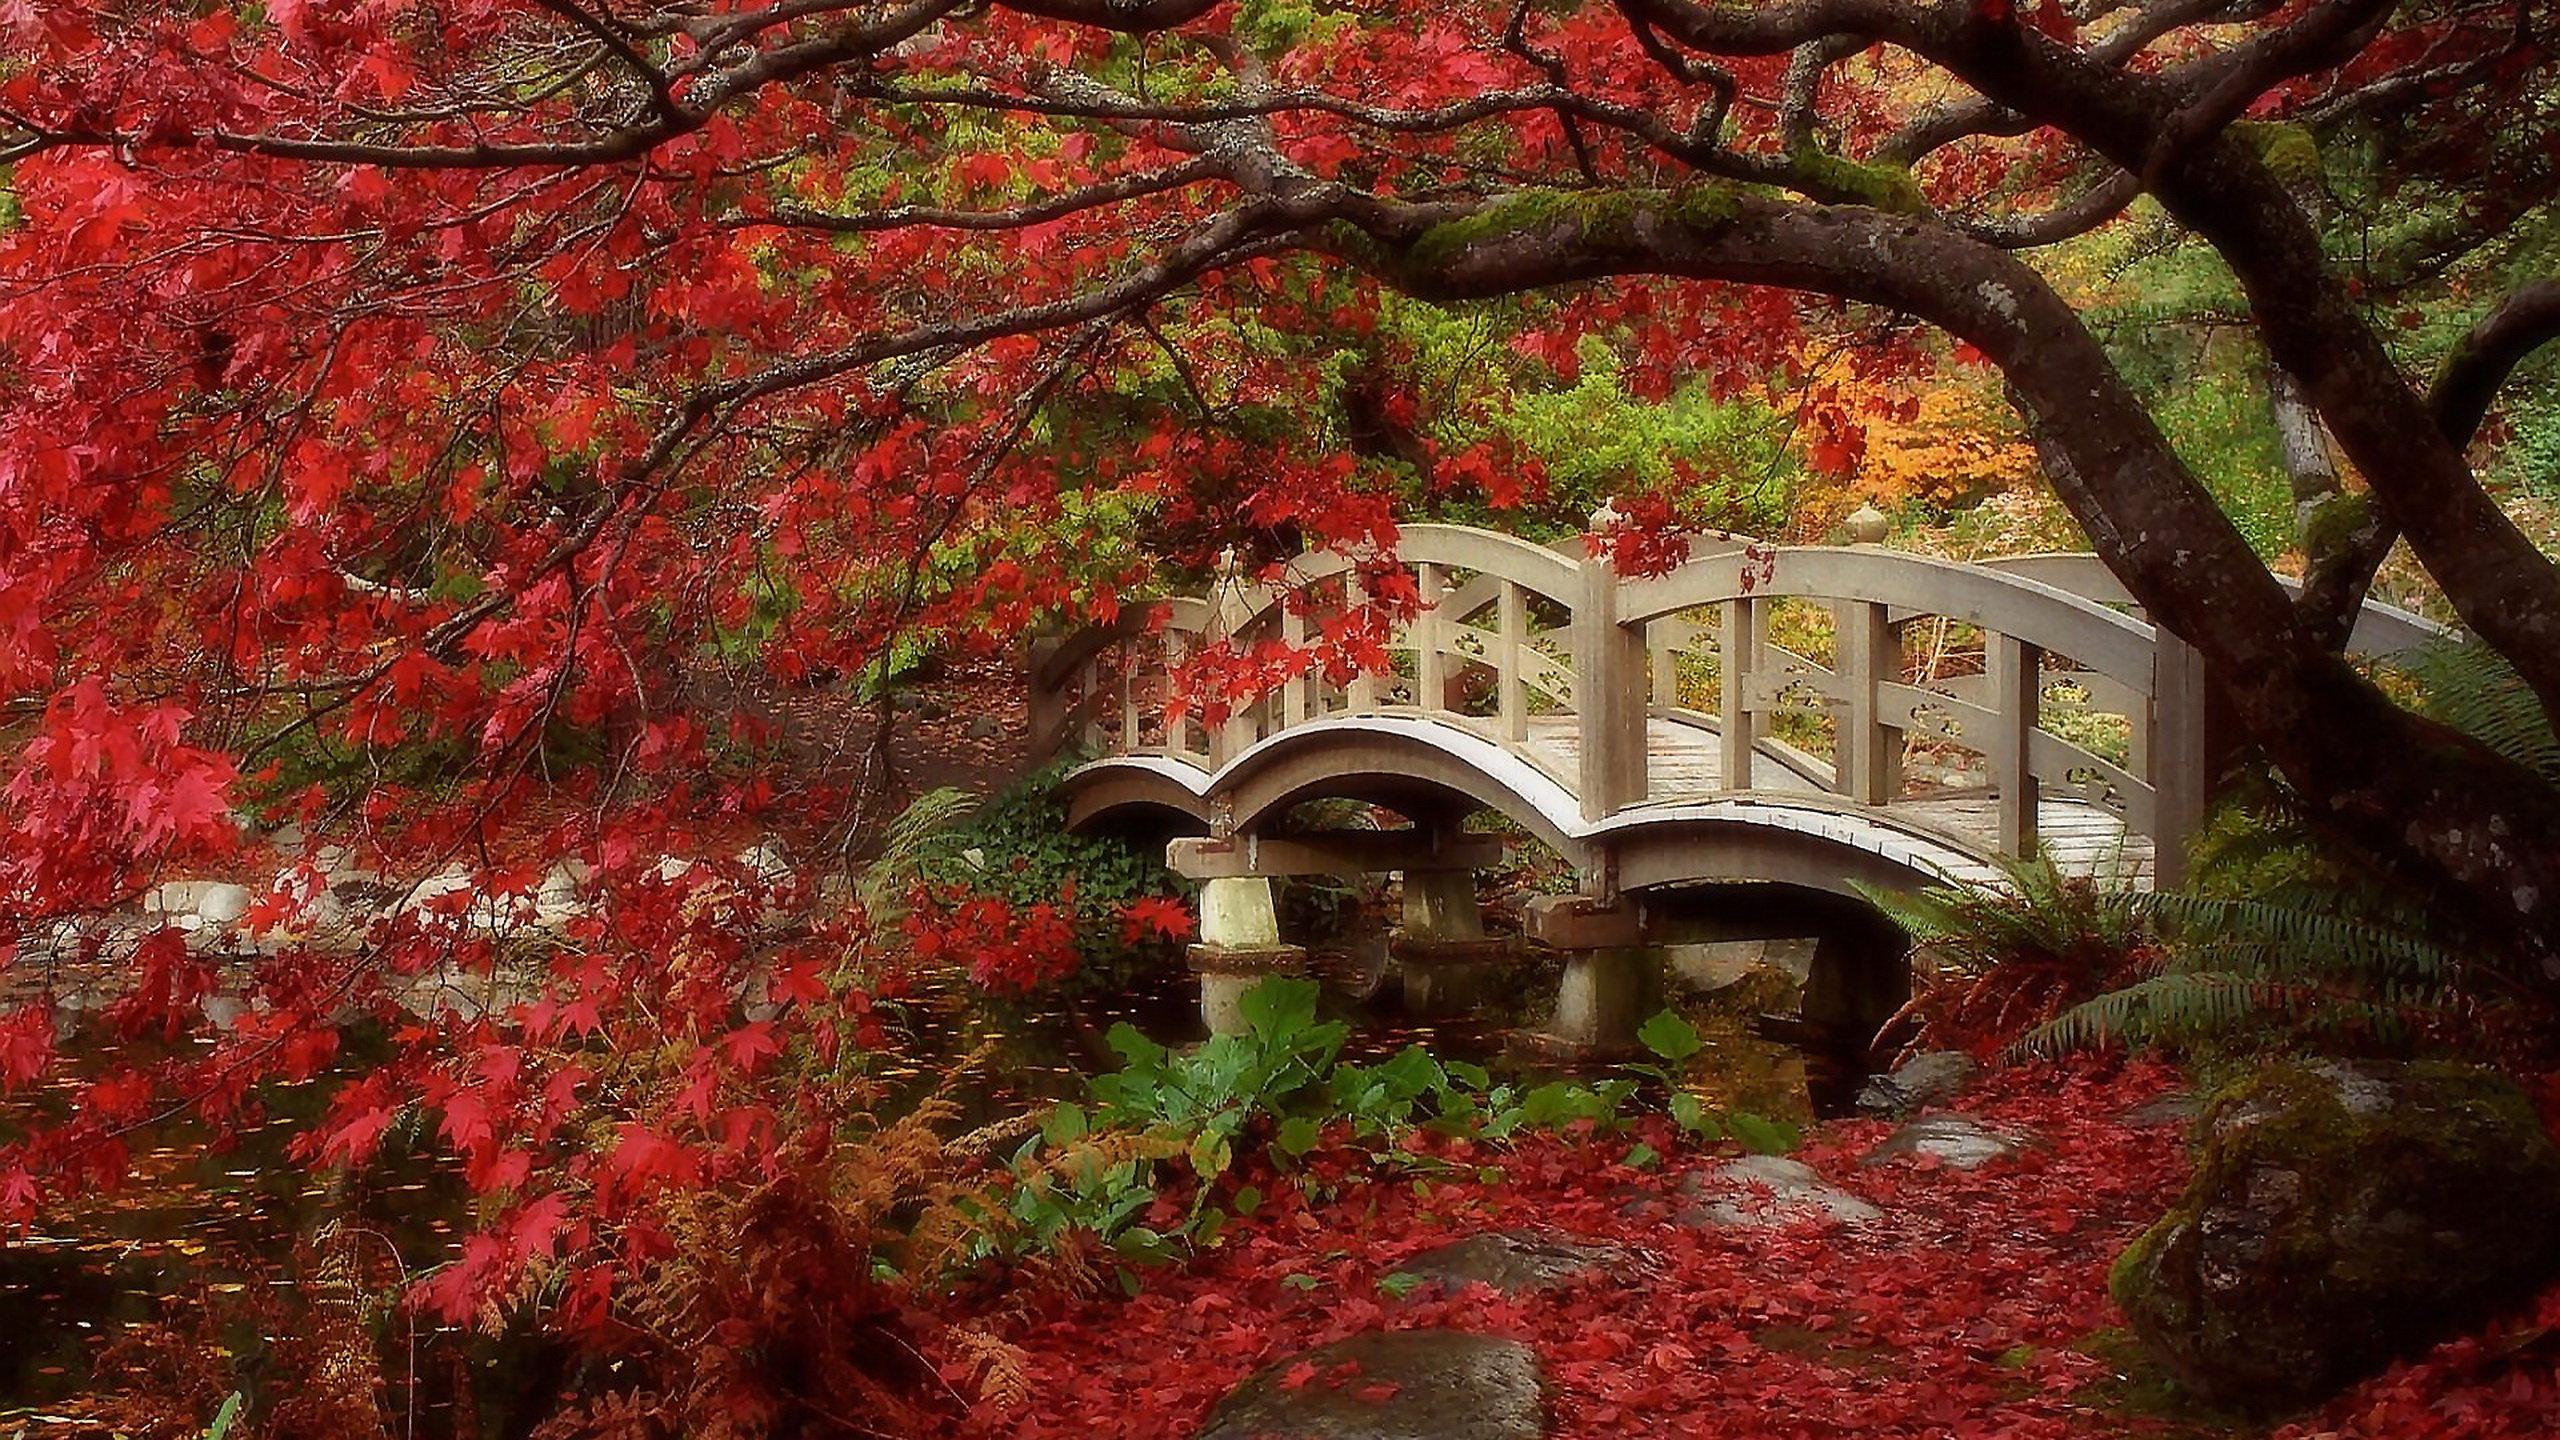 Best Japanese Garden Wallpaper ID92632 For High Resolution Hd 2560x1440 PC